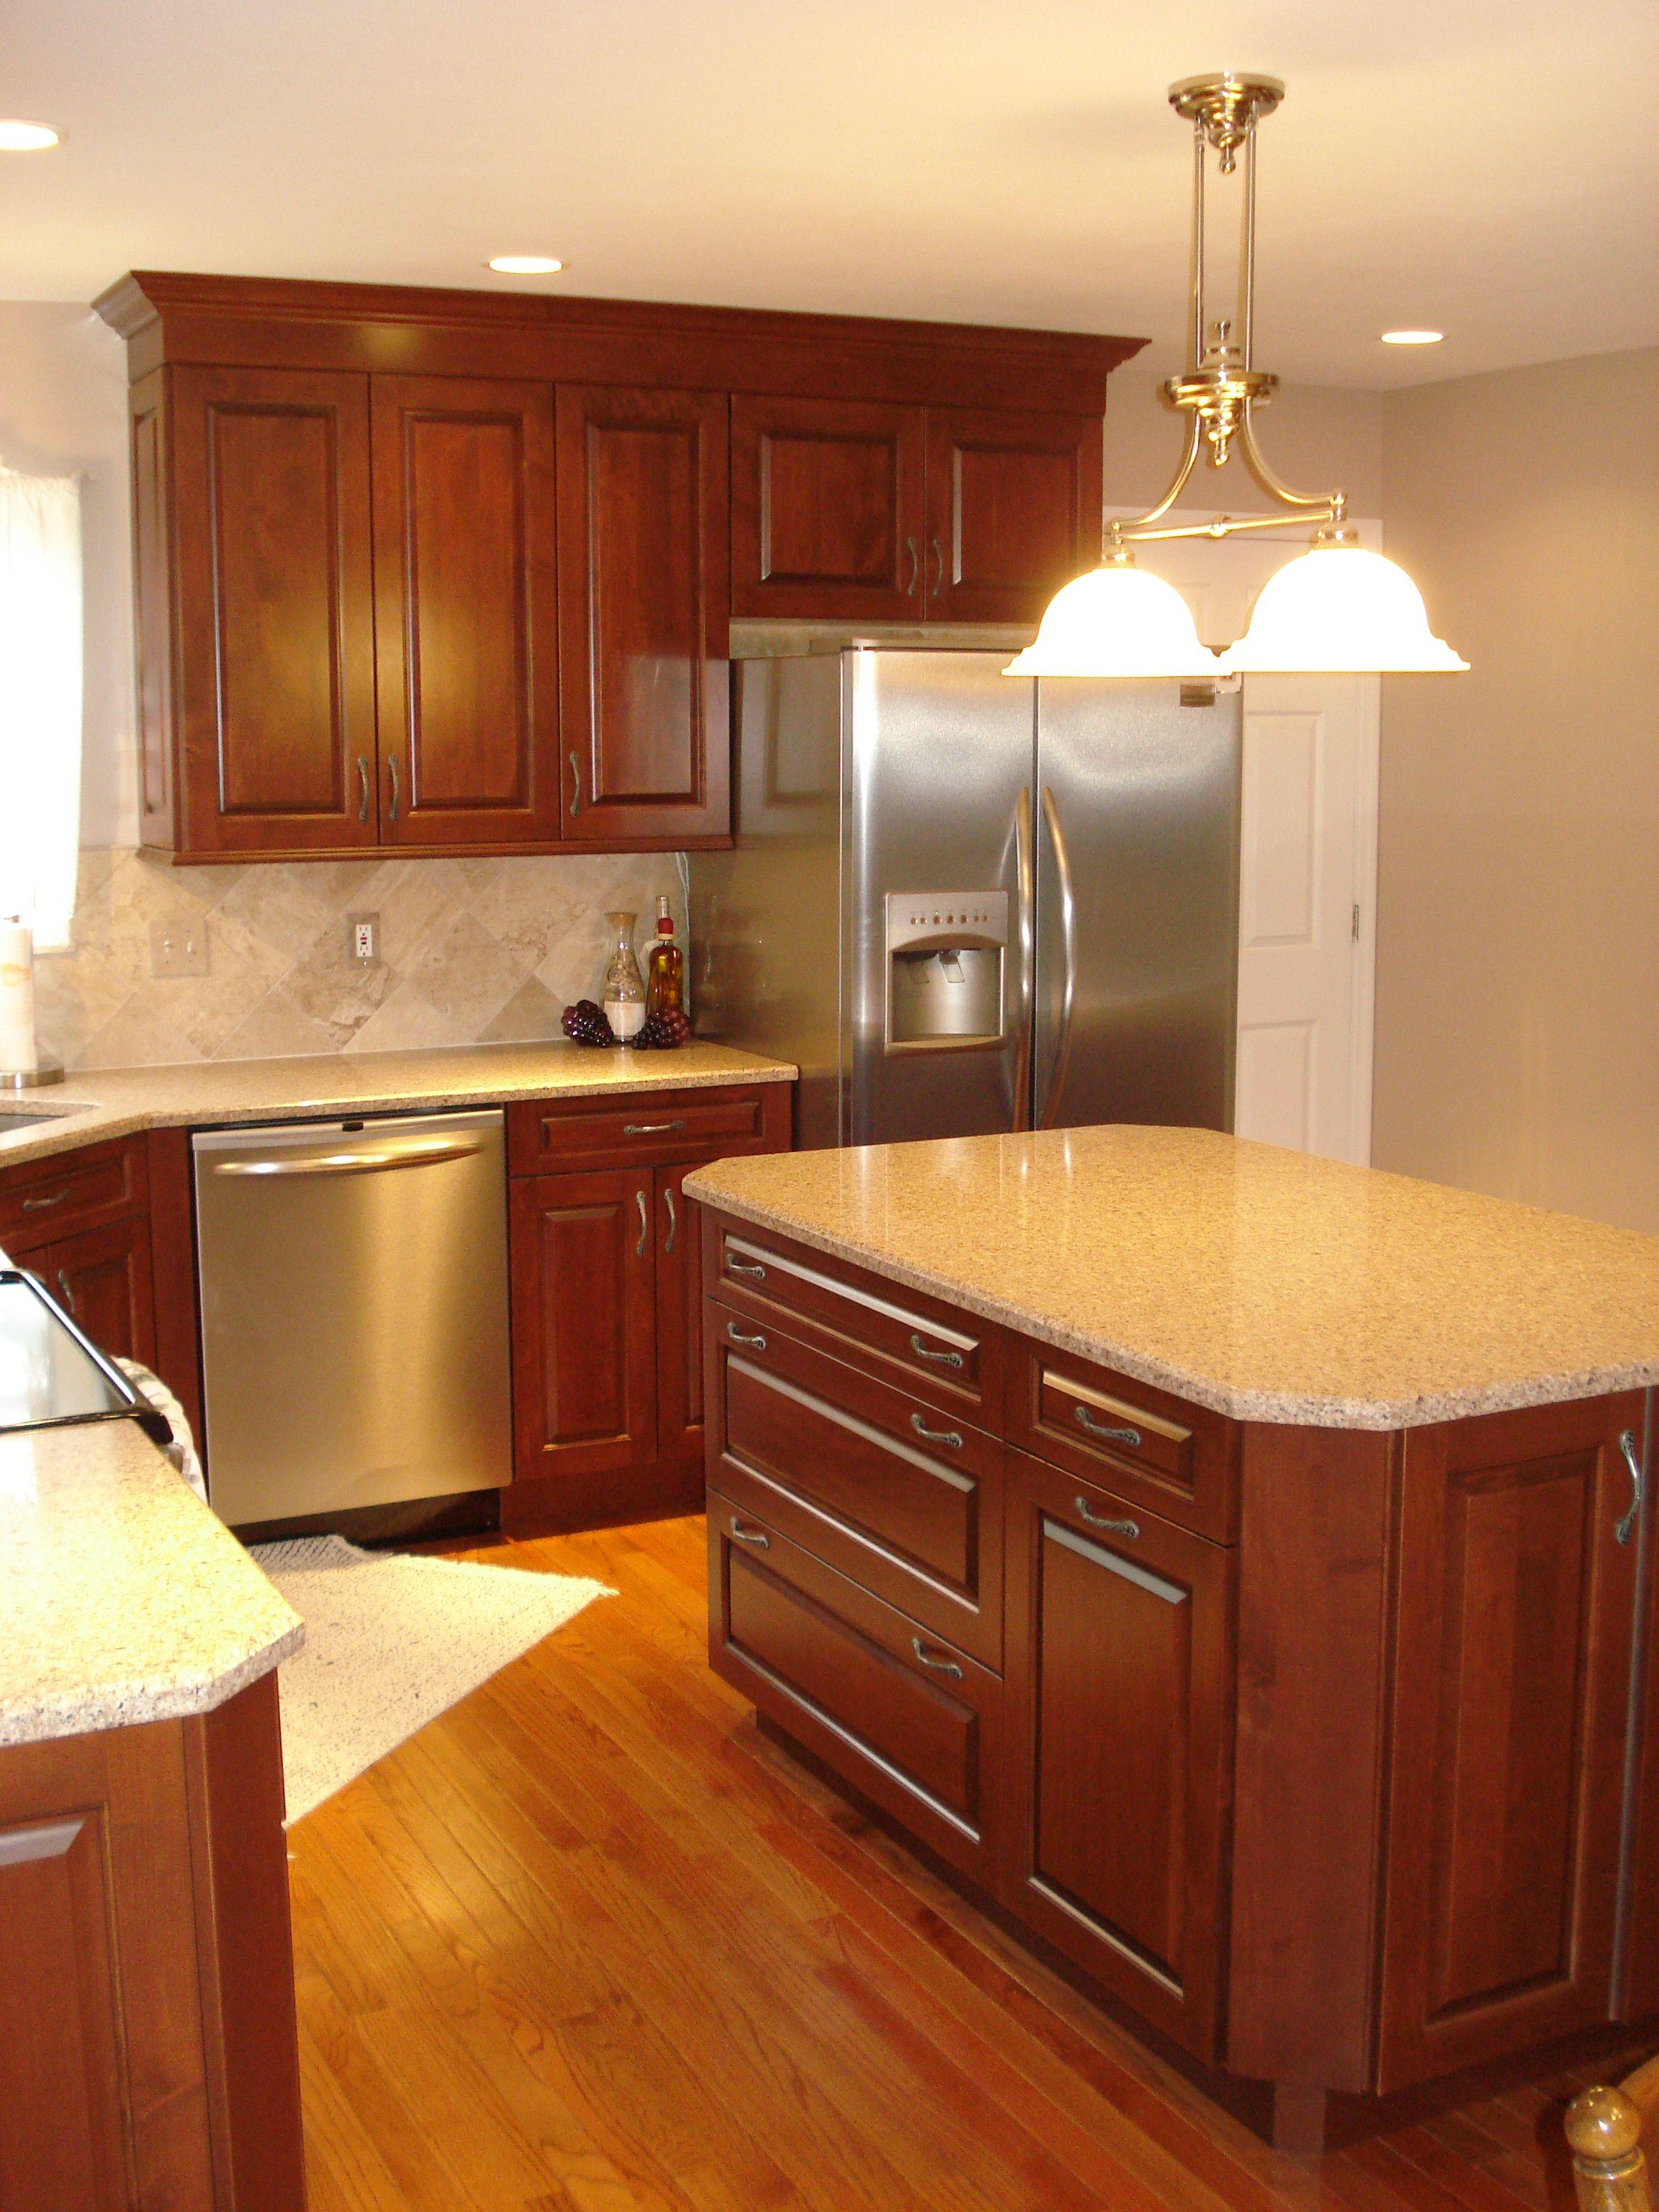 Kitchen Renovation Maple Ridge: Brookhaven Edgemont Candlelight On Maple